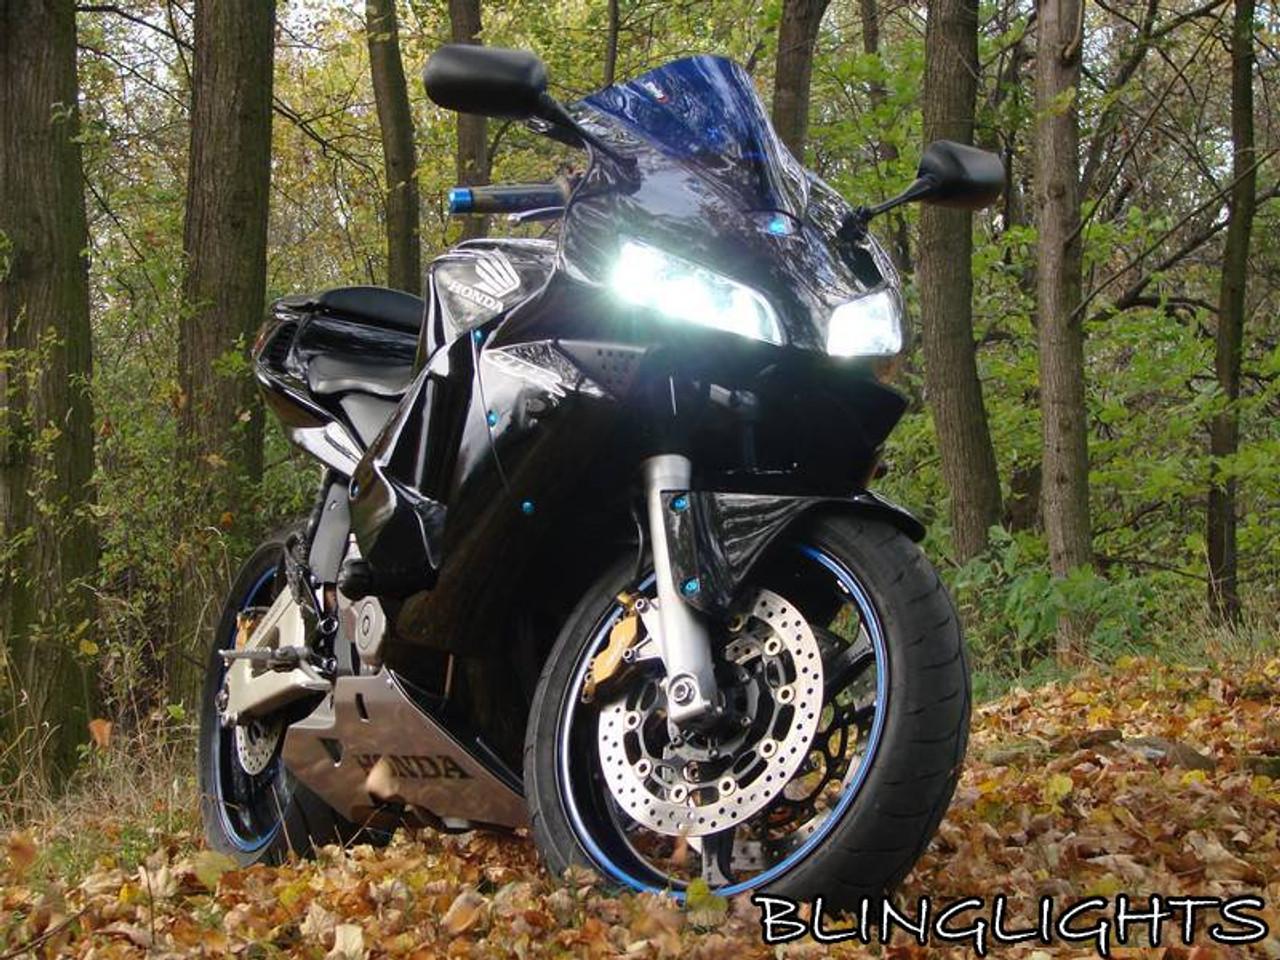 Honda CBR600RR Bright White Low High Light Bulbs for Headlamps Headlights Head Lamps Lights